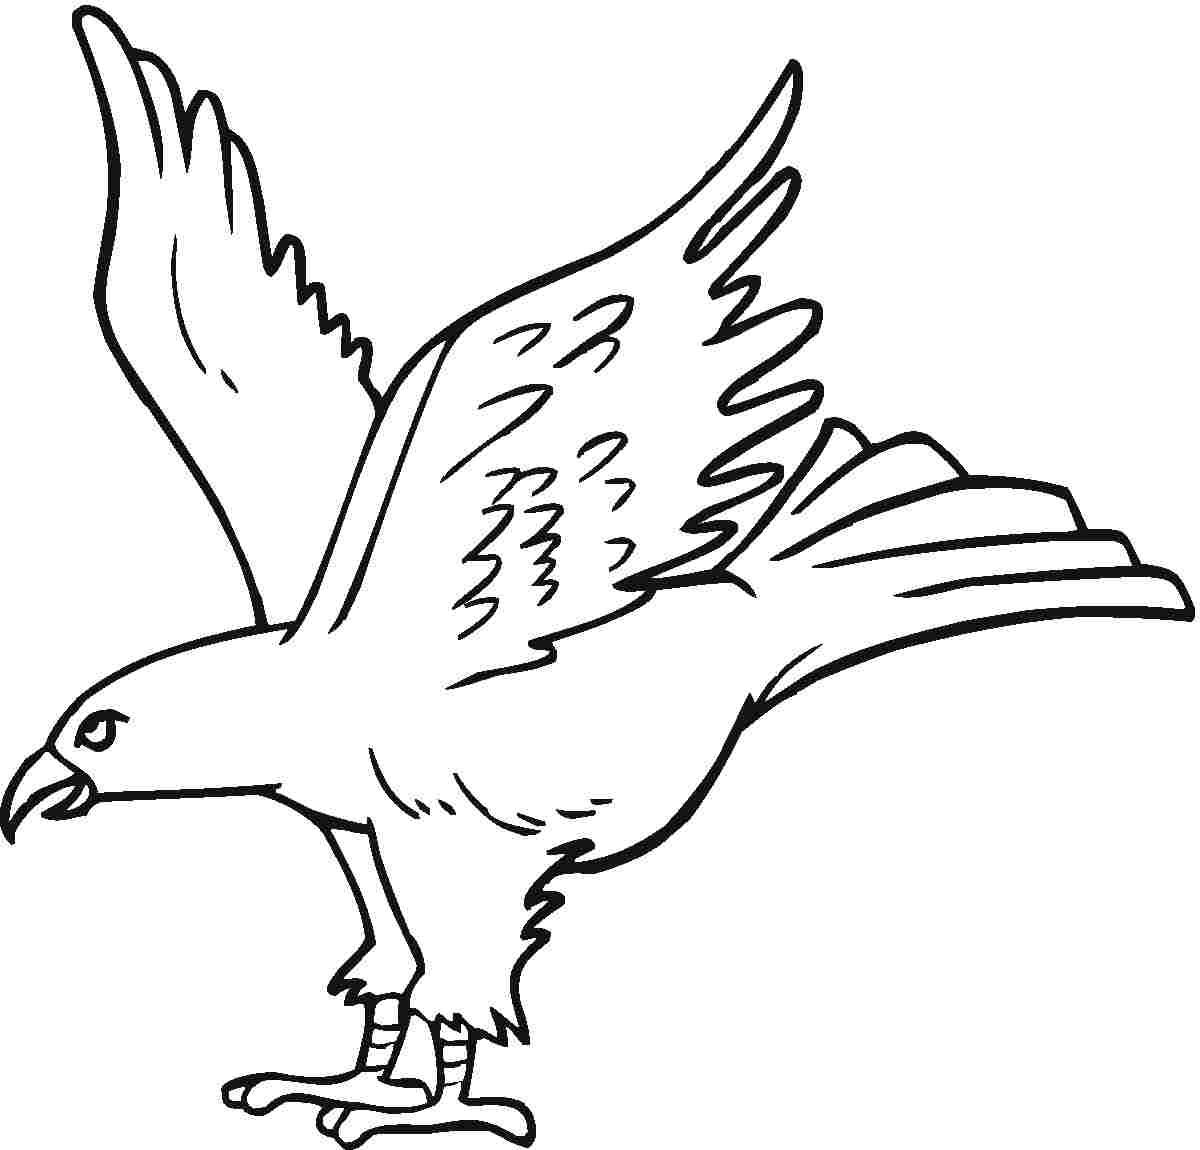 free printable coloring pages eagle bald eagle coloring page tim39s printables coloring pages eagle free printable